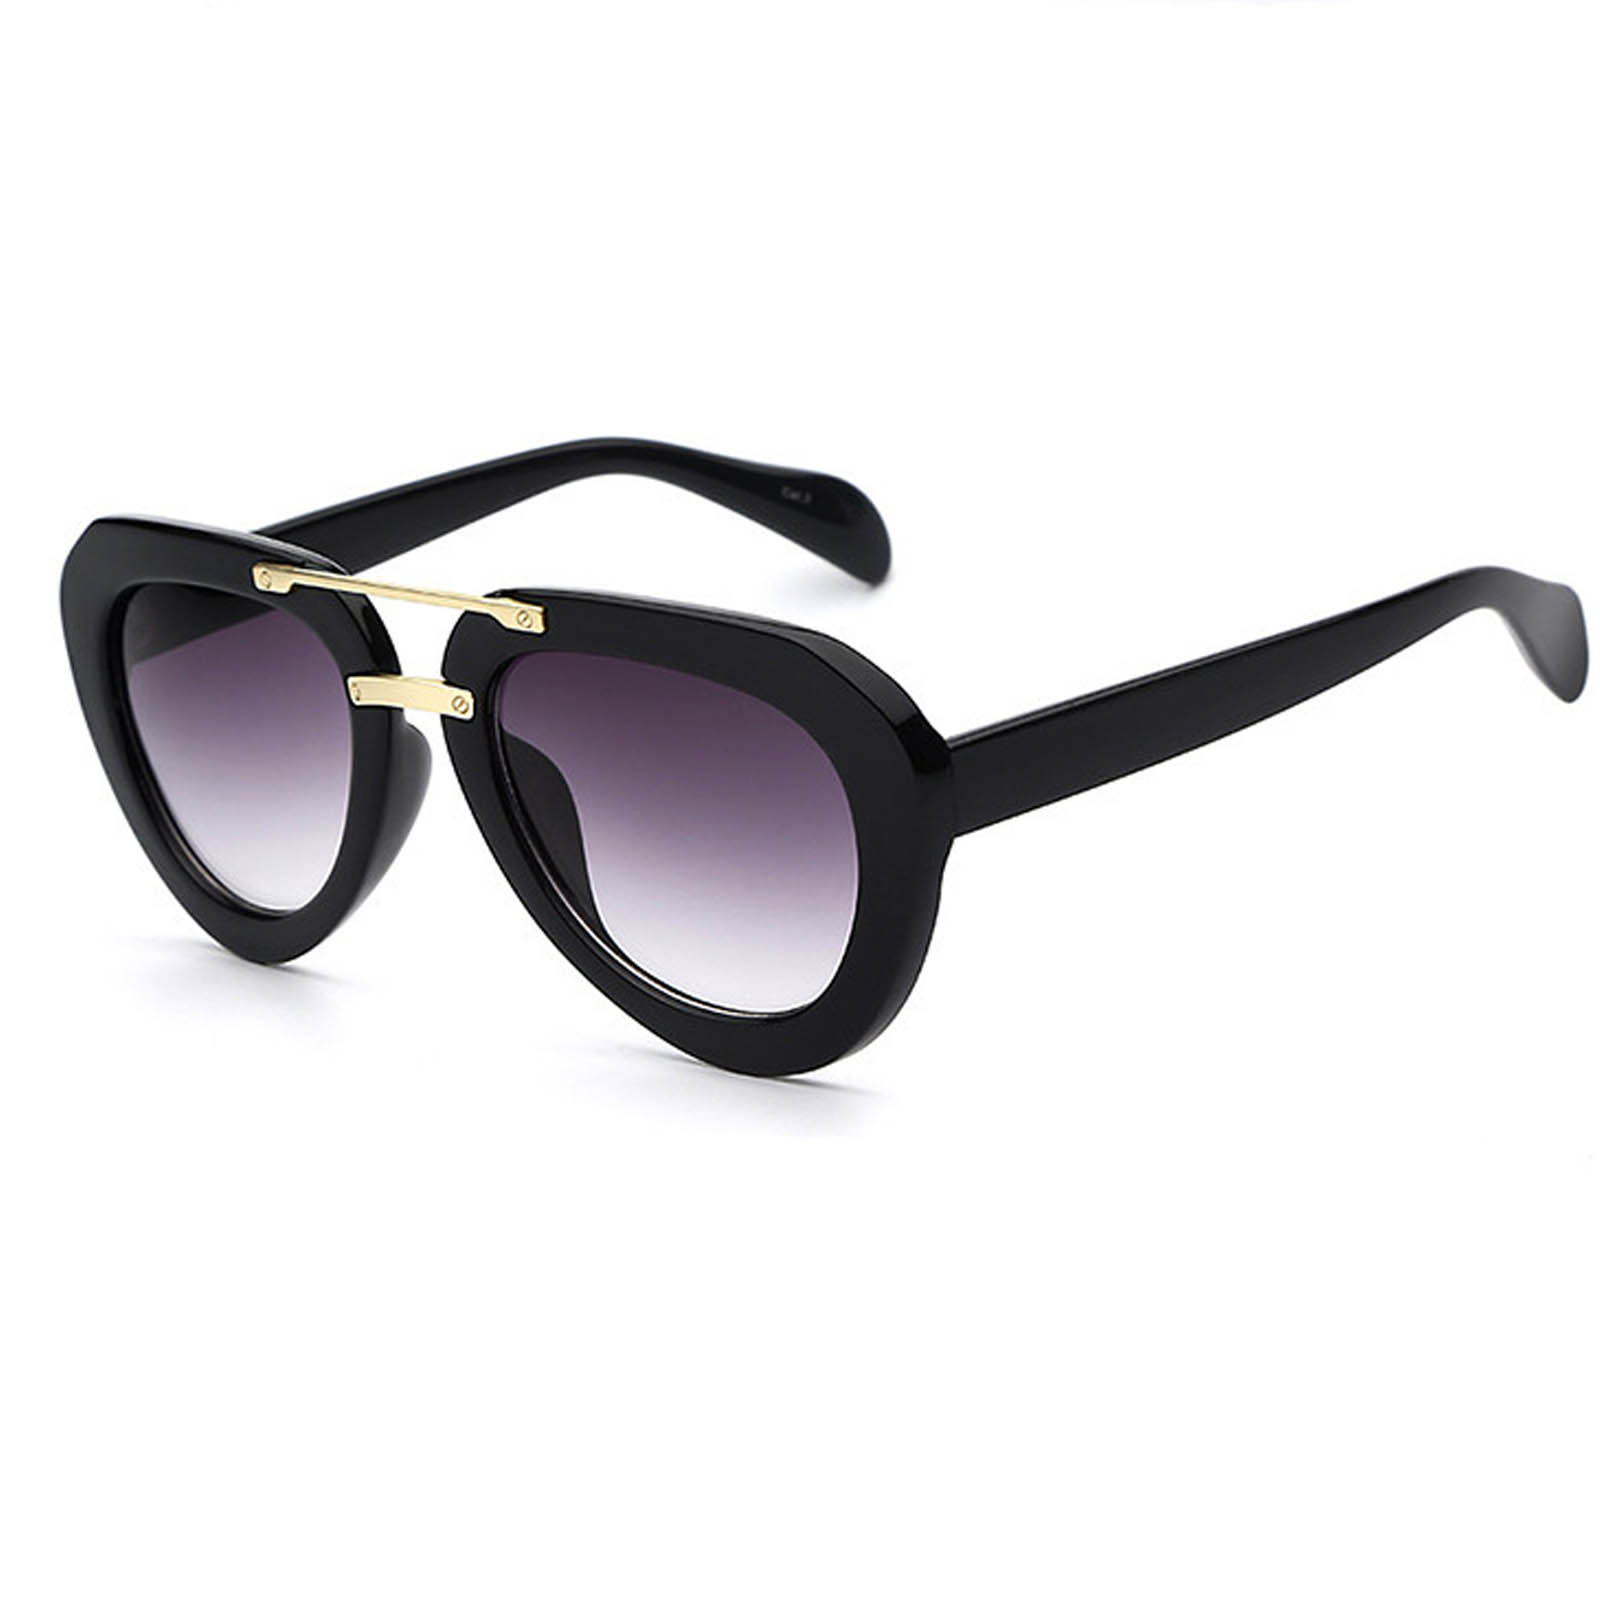 OWL ® 028 C1 Aviator Eyewear Sunglasses Women's Men's Plastic Black Frame Smoke Lens One Pair